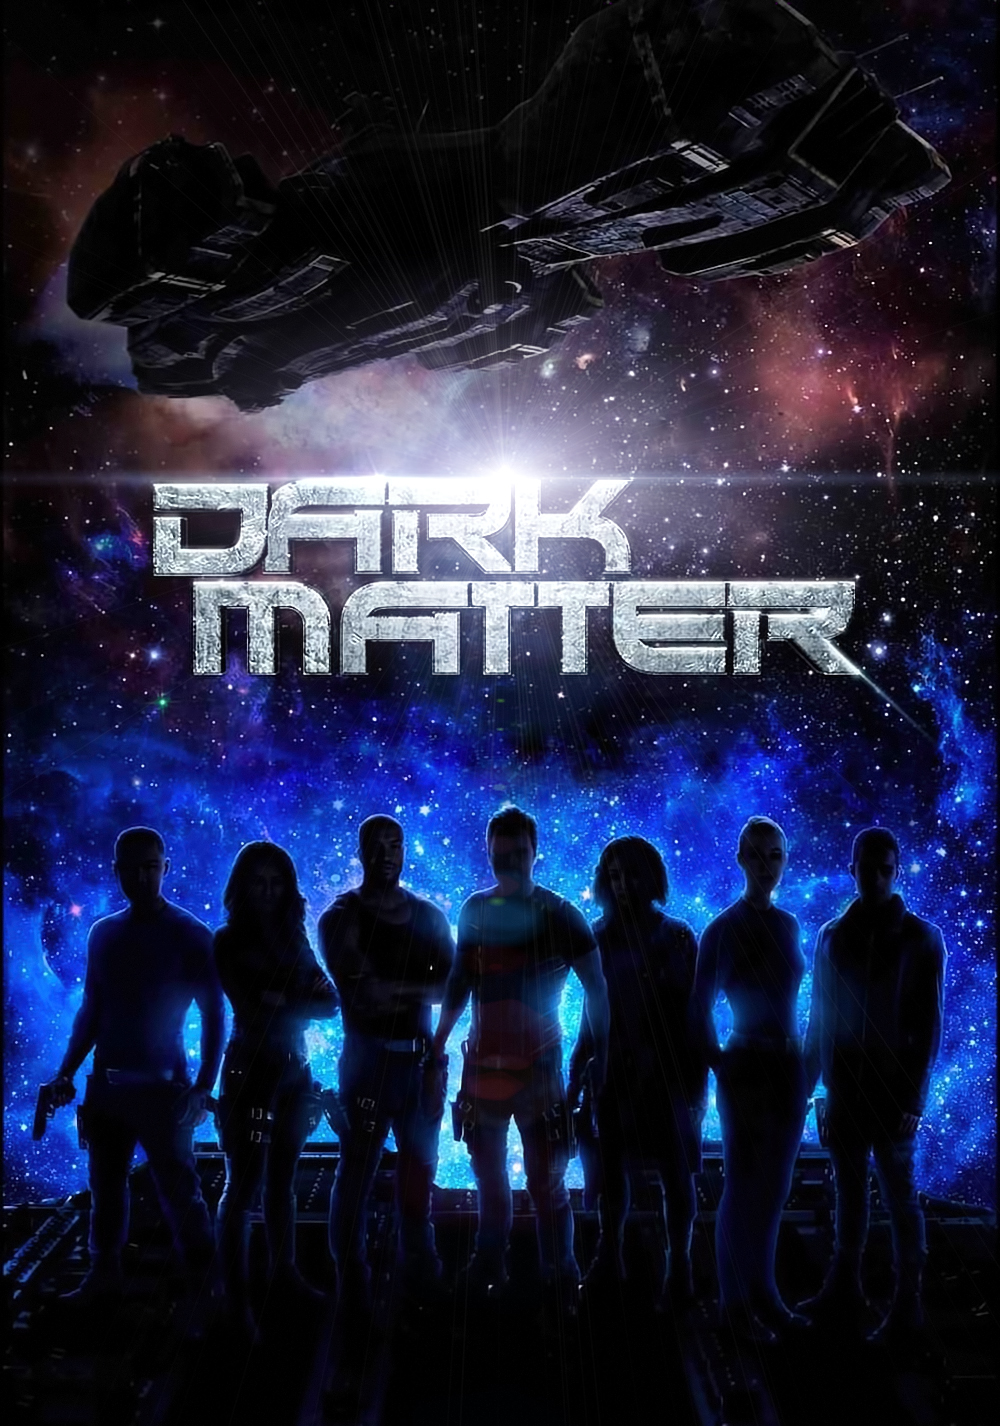 Dark Matter Cast Image Id 115086 Image Abyss